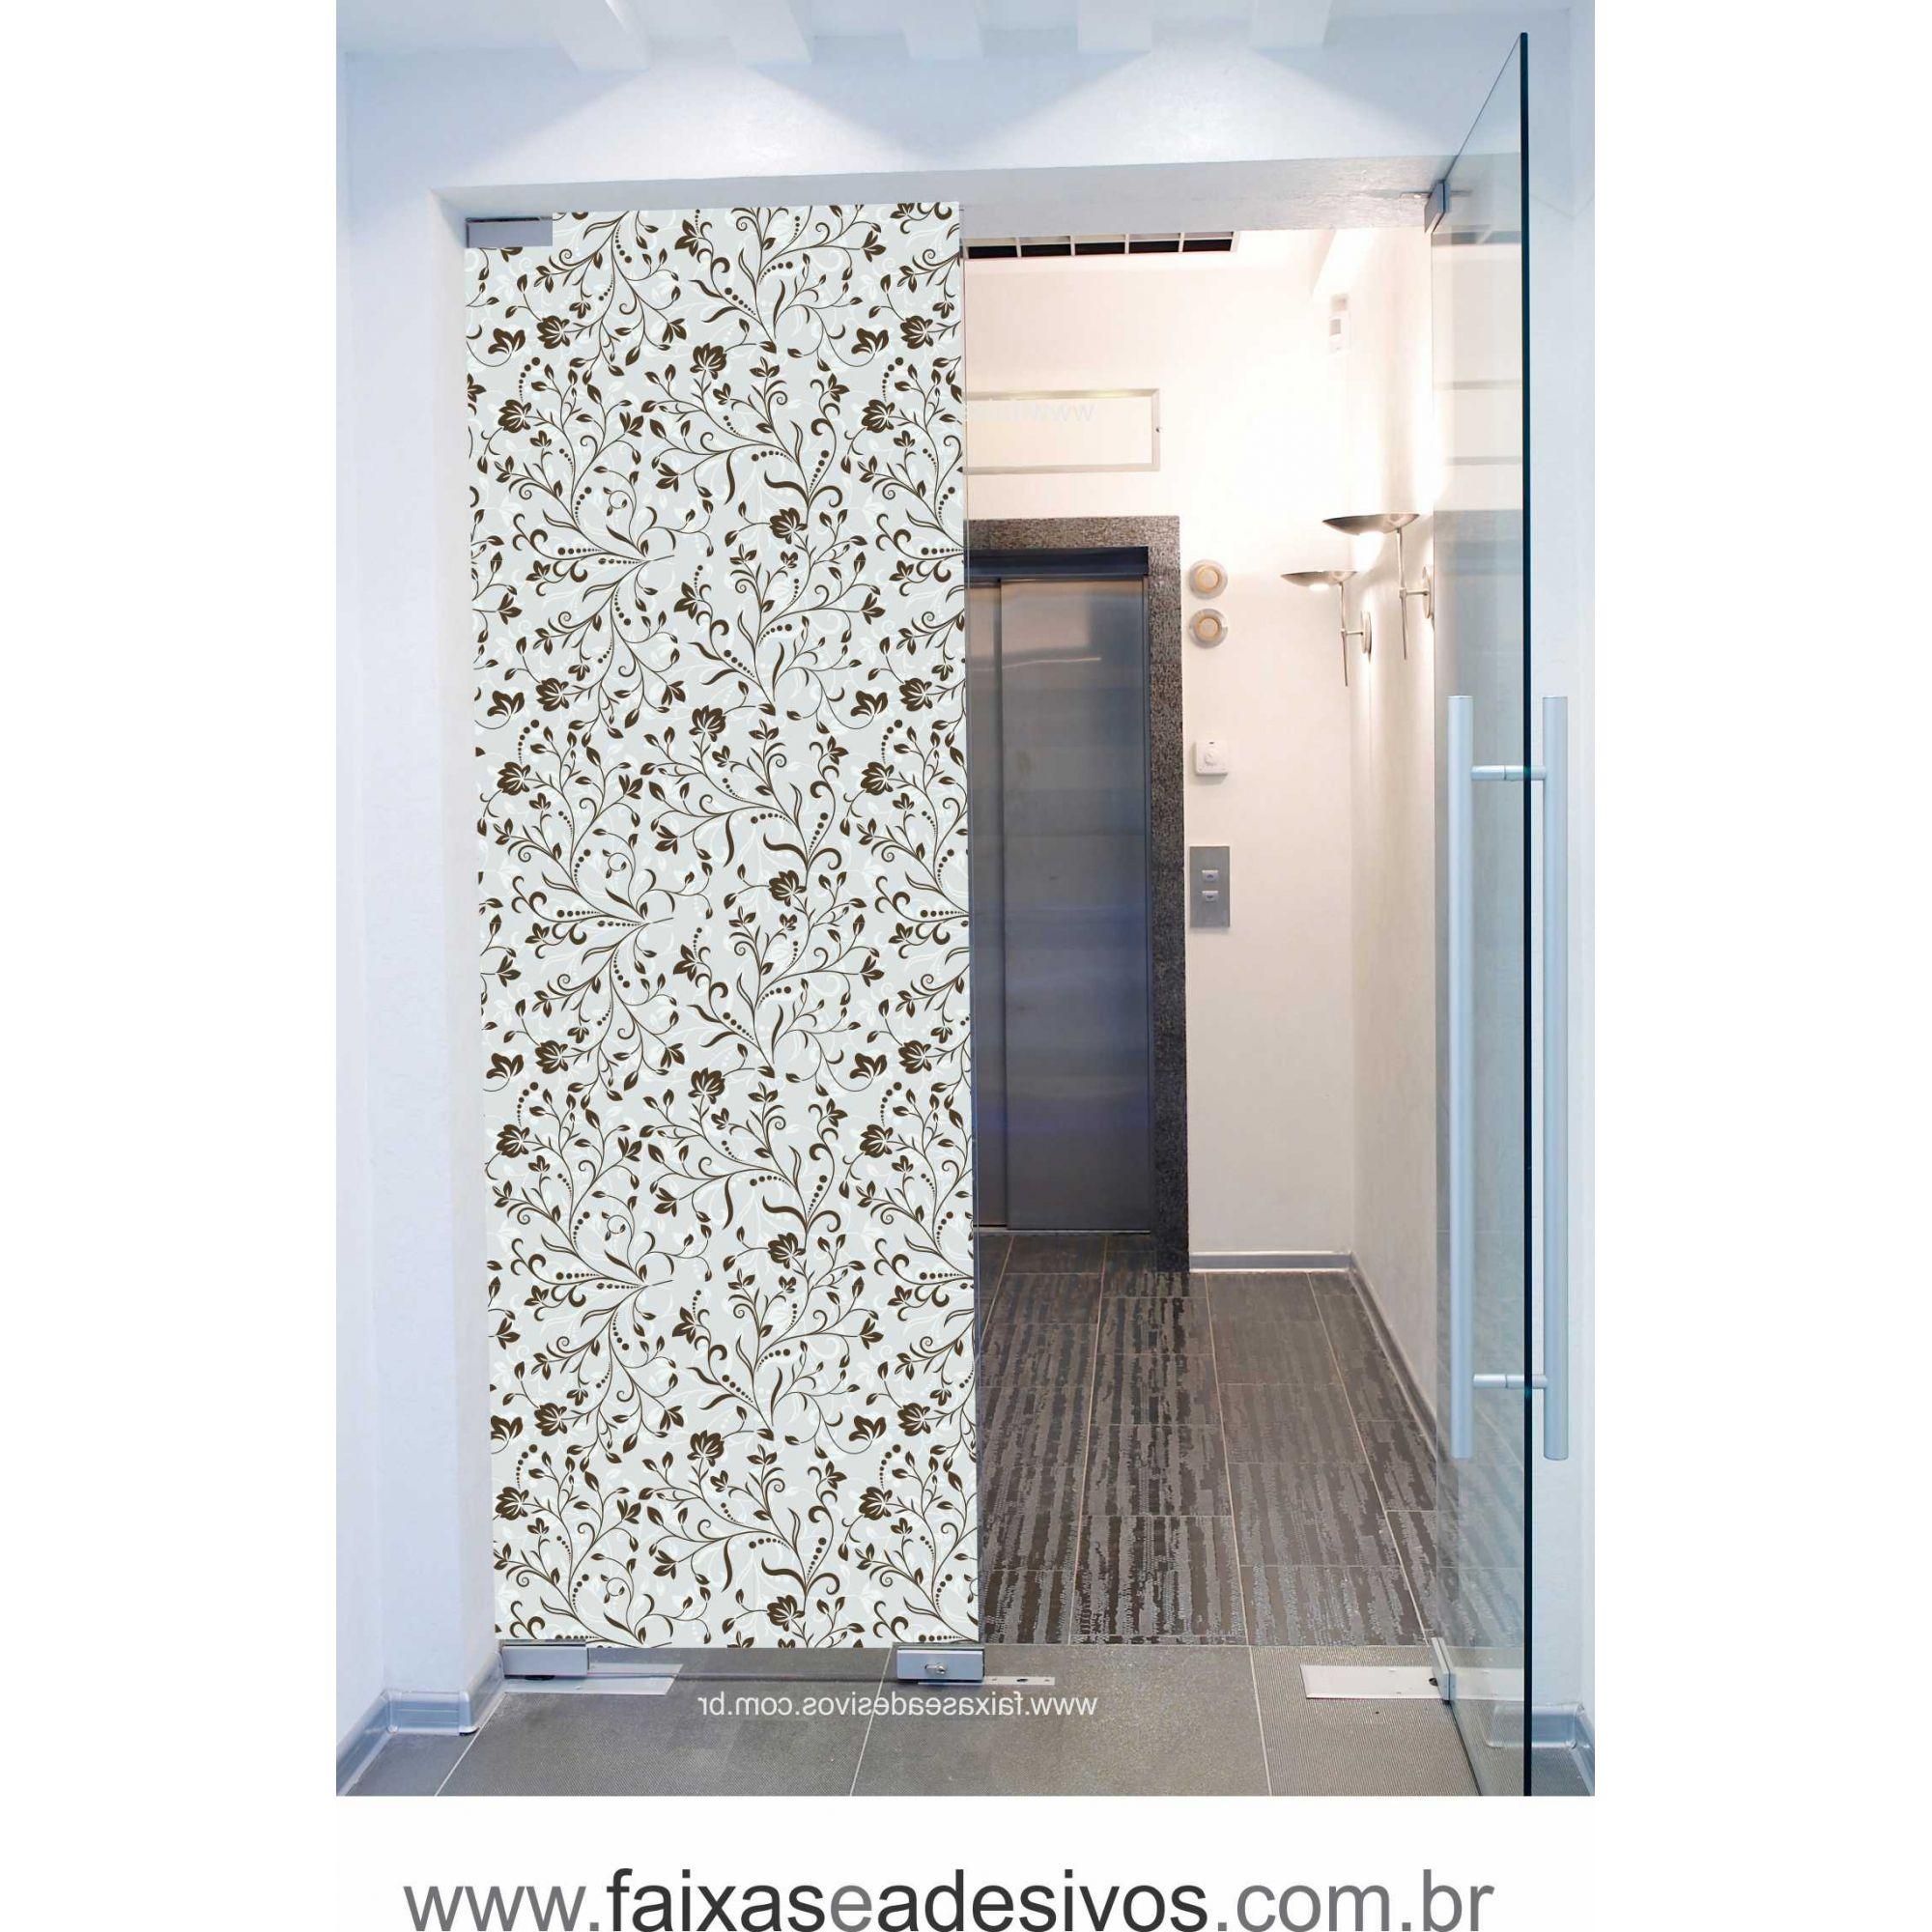 069 VD - Adesivo Jateado para vidro Floralzinho  210x70cm  - Fac Signs